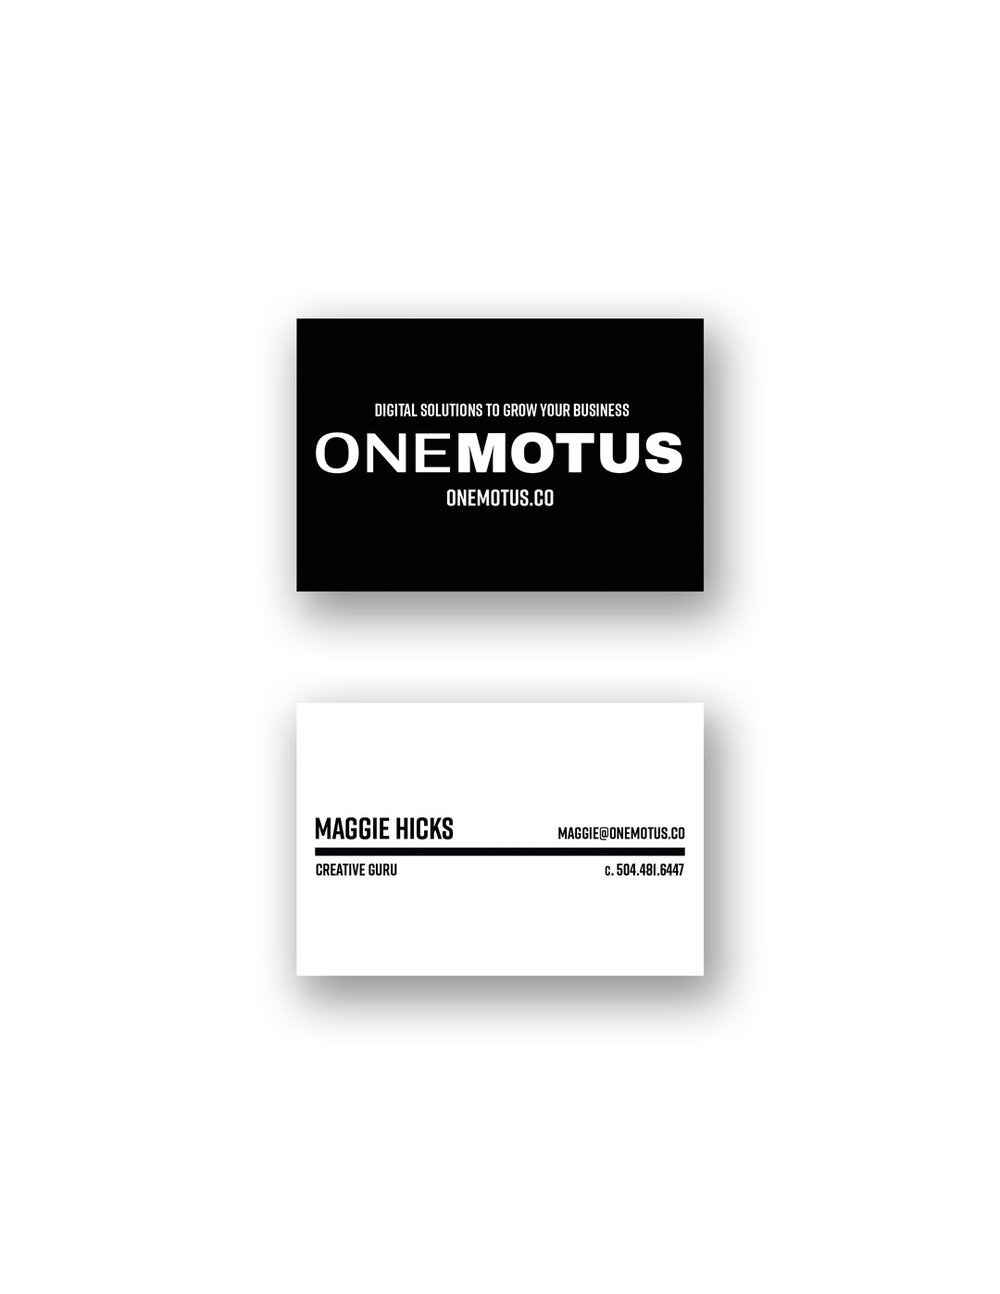 motus-cards.jpg